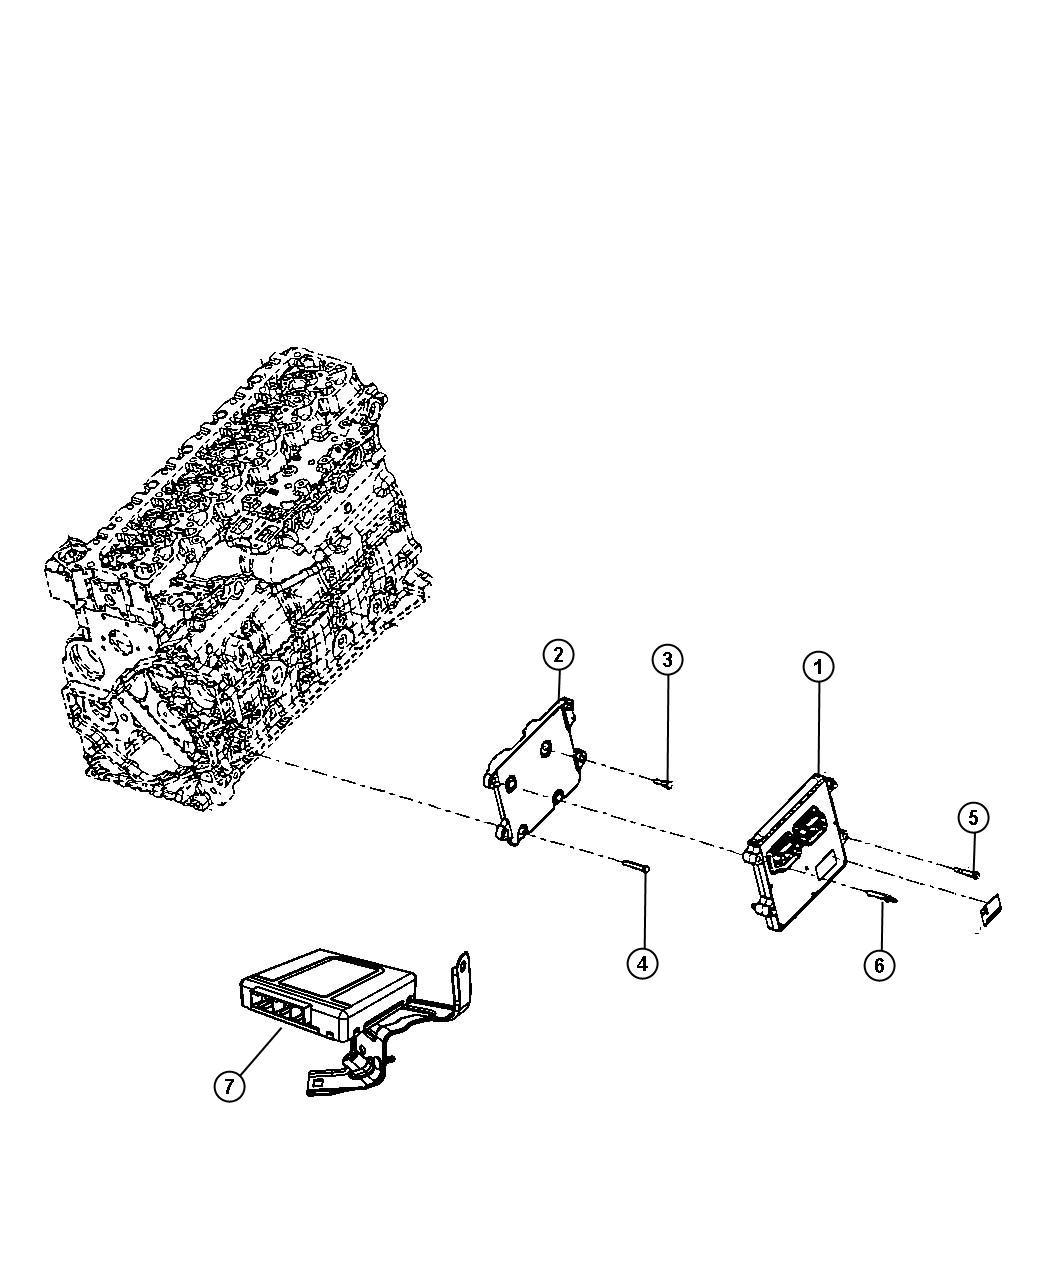 2008 Dodge Ram 3500 Module. Transmission control